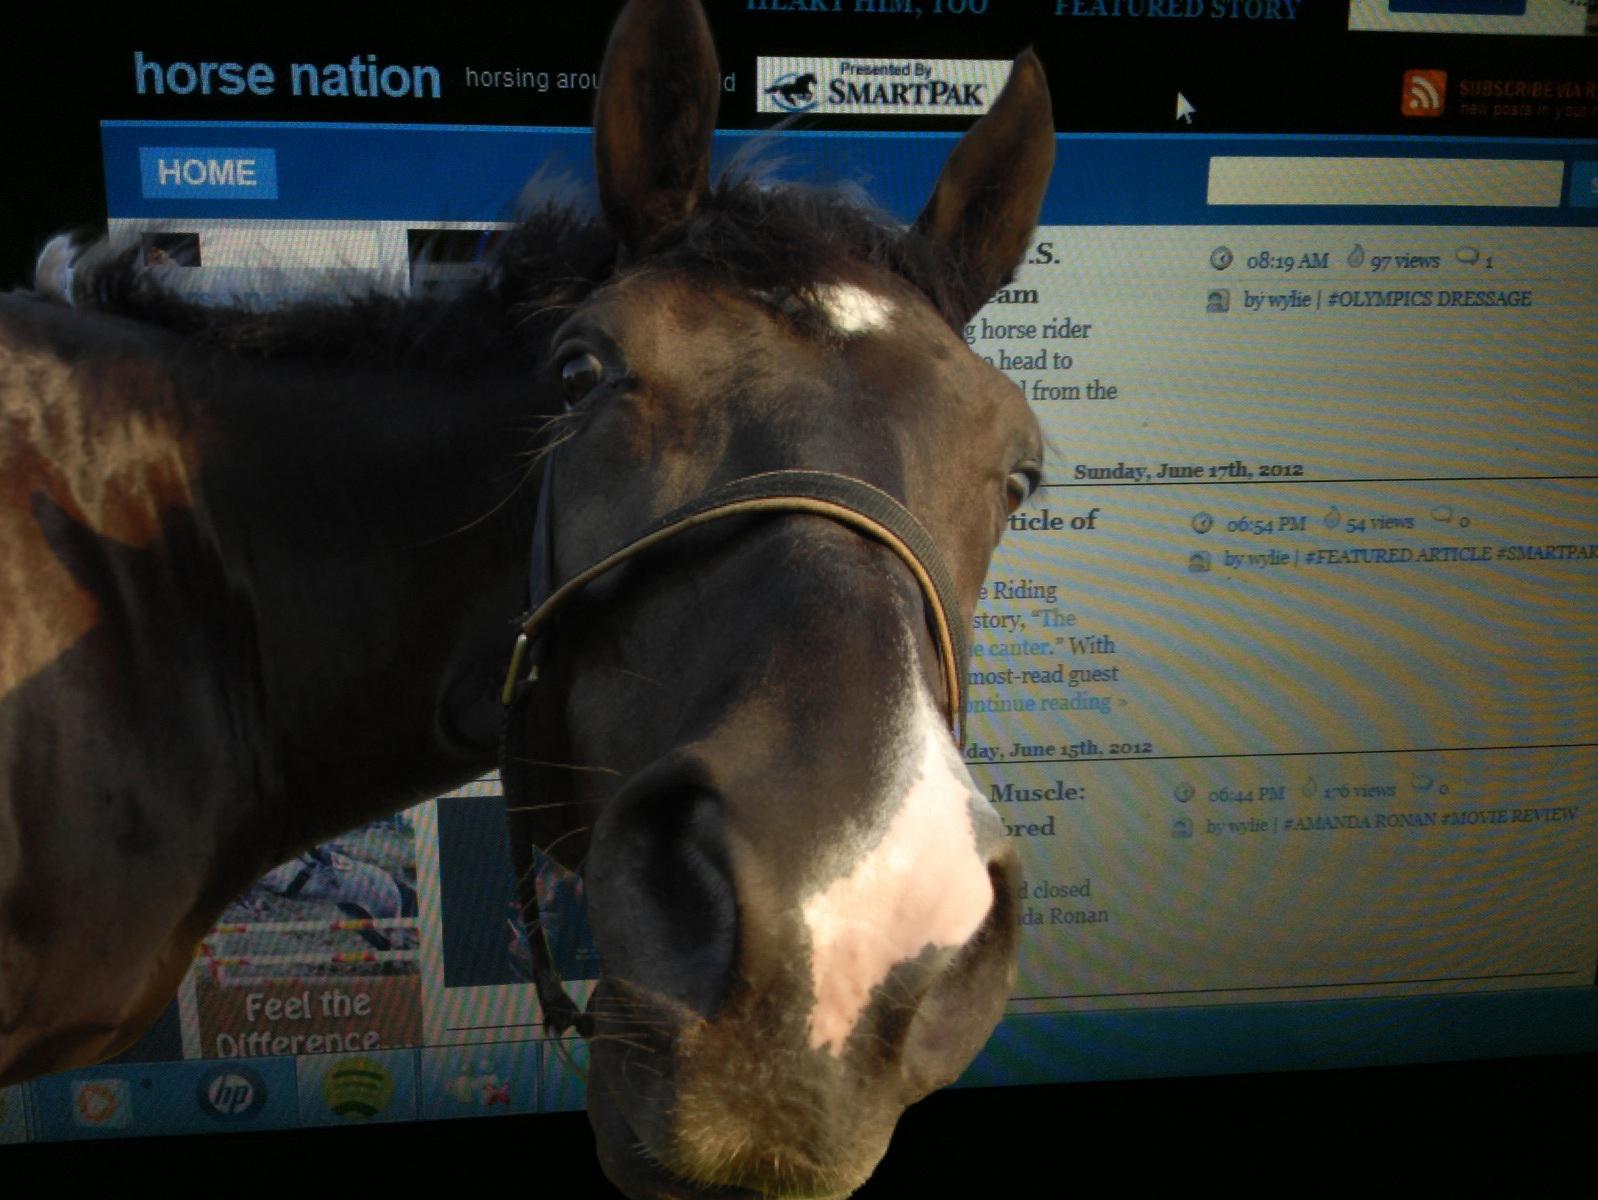 horsenation1